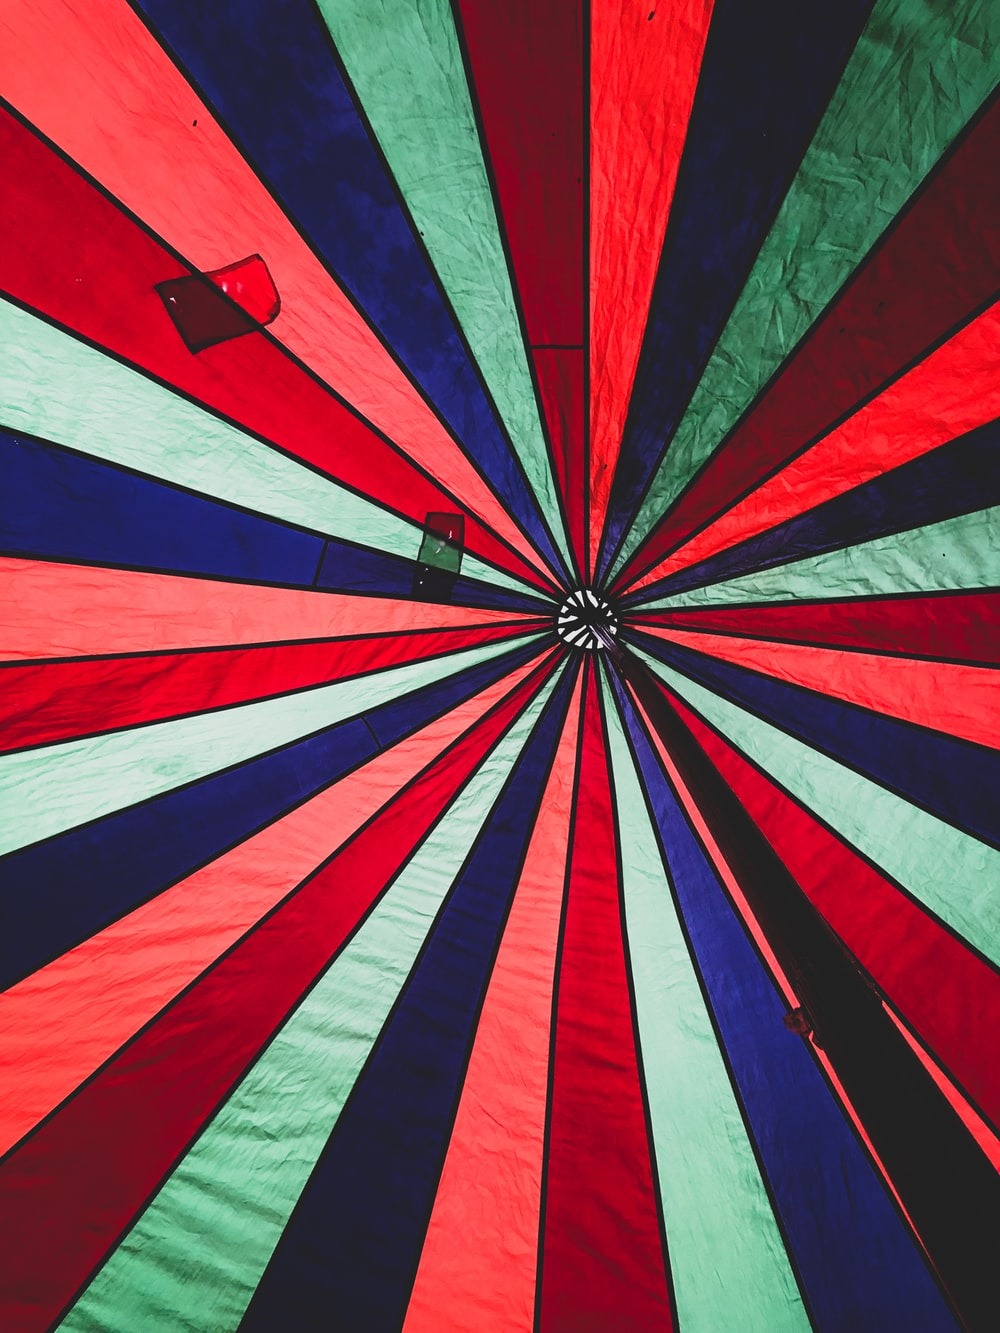 red white and blue striped umbrella